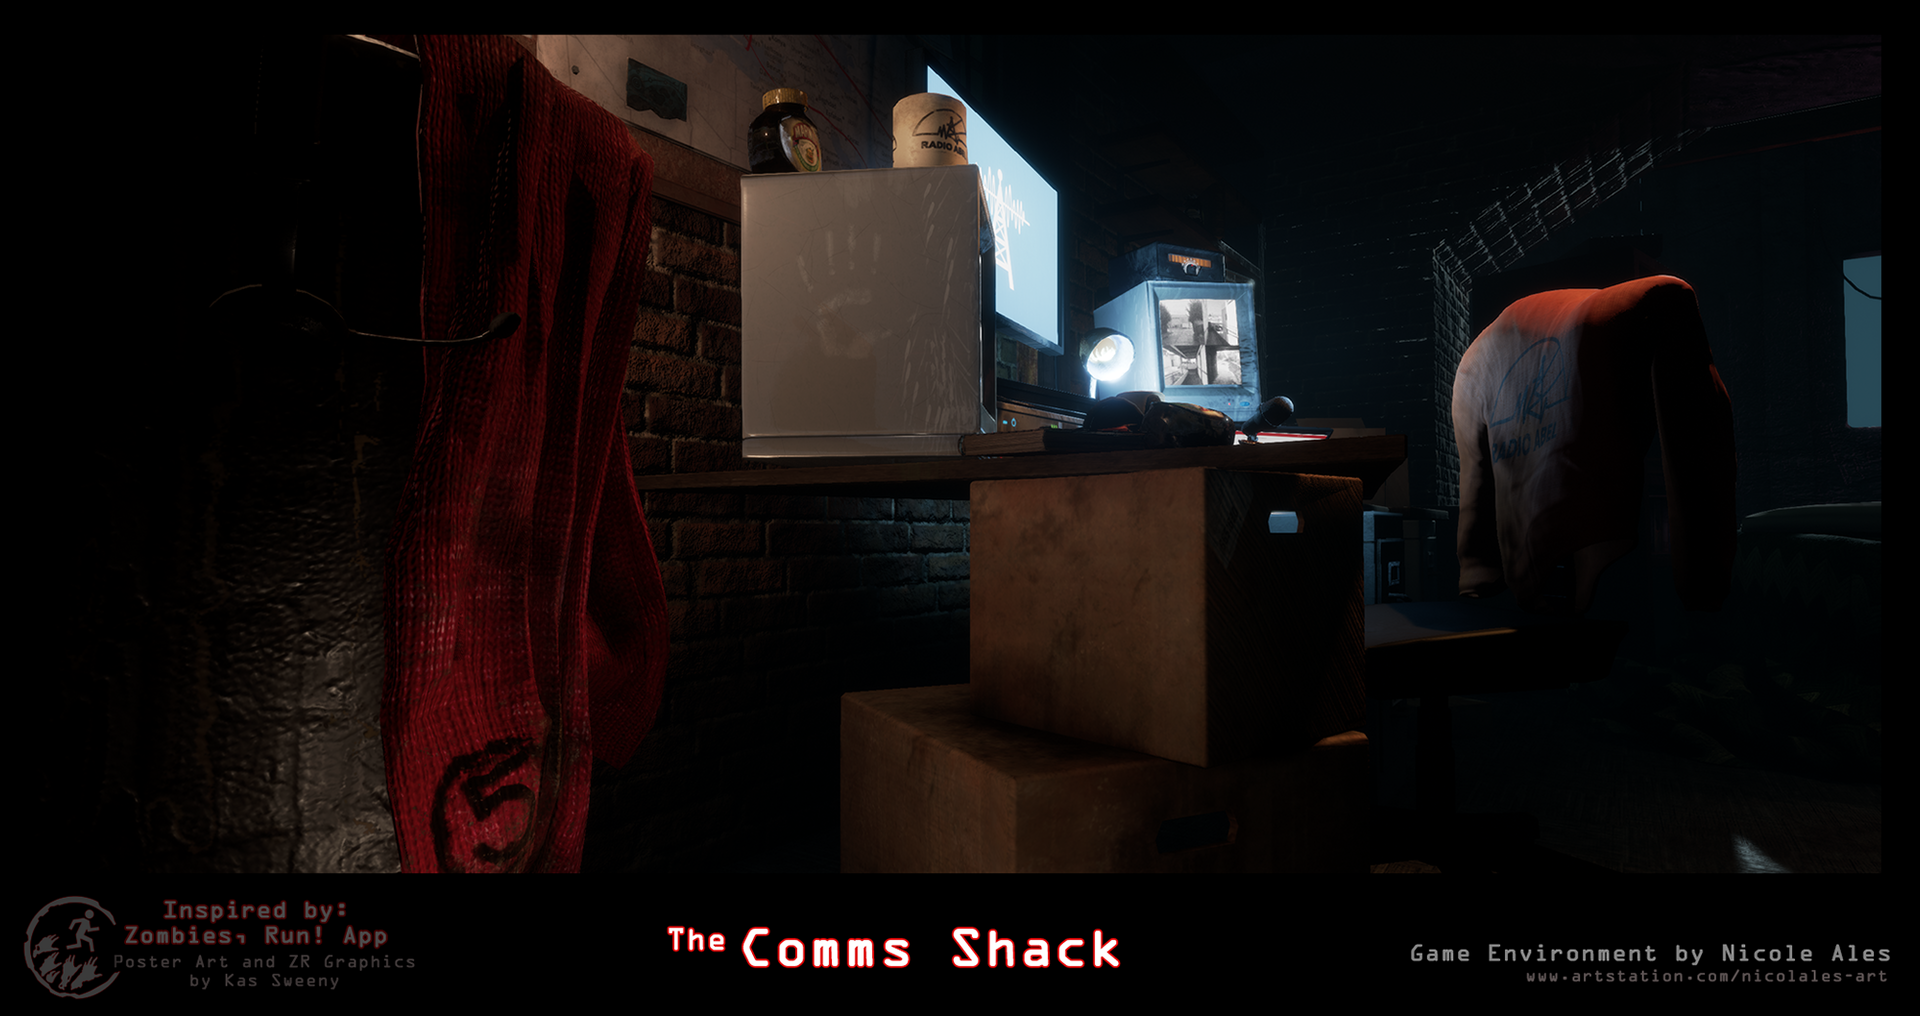 CommsShack_gameEnvironment_nicoleAles_04.png